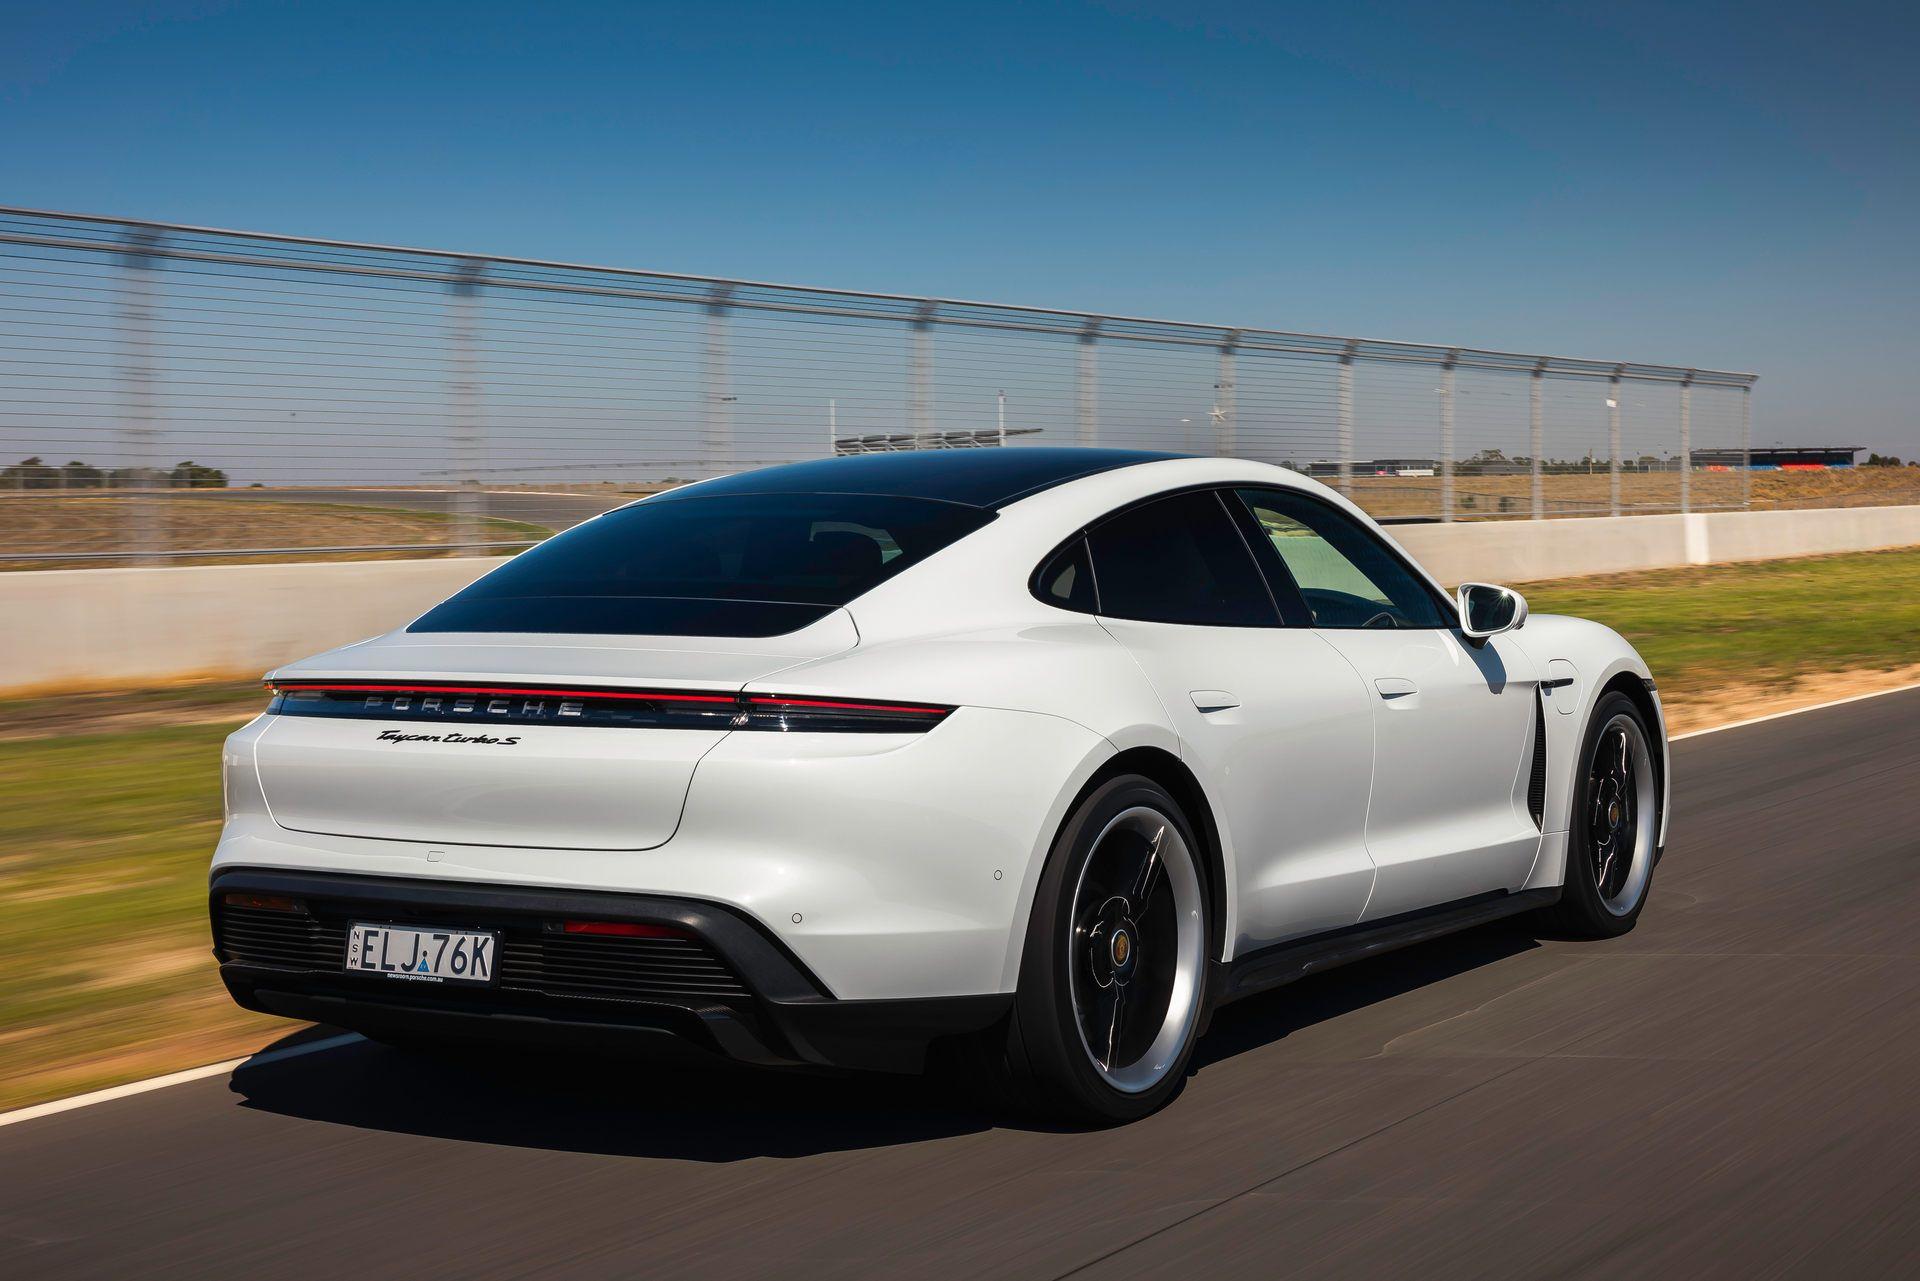 Porsche-Taycan-Turbo-S-The-Bend-Motorsport-Park-47